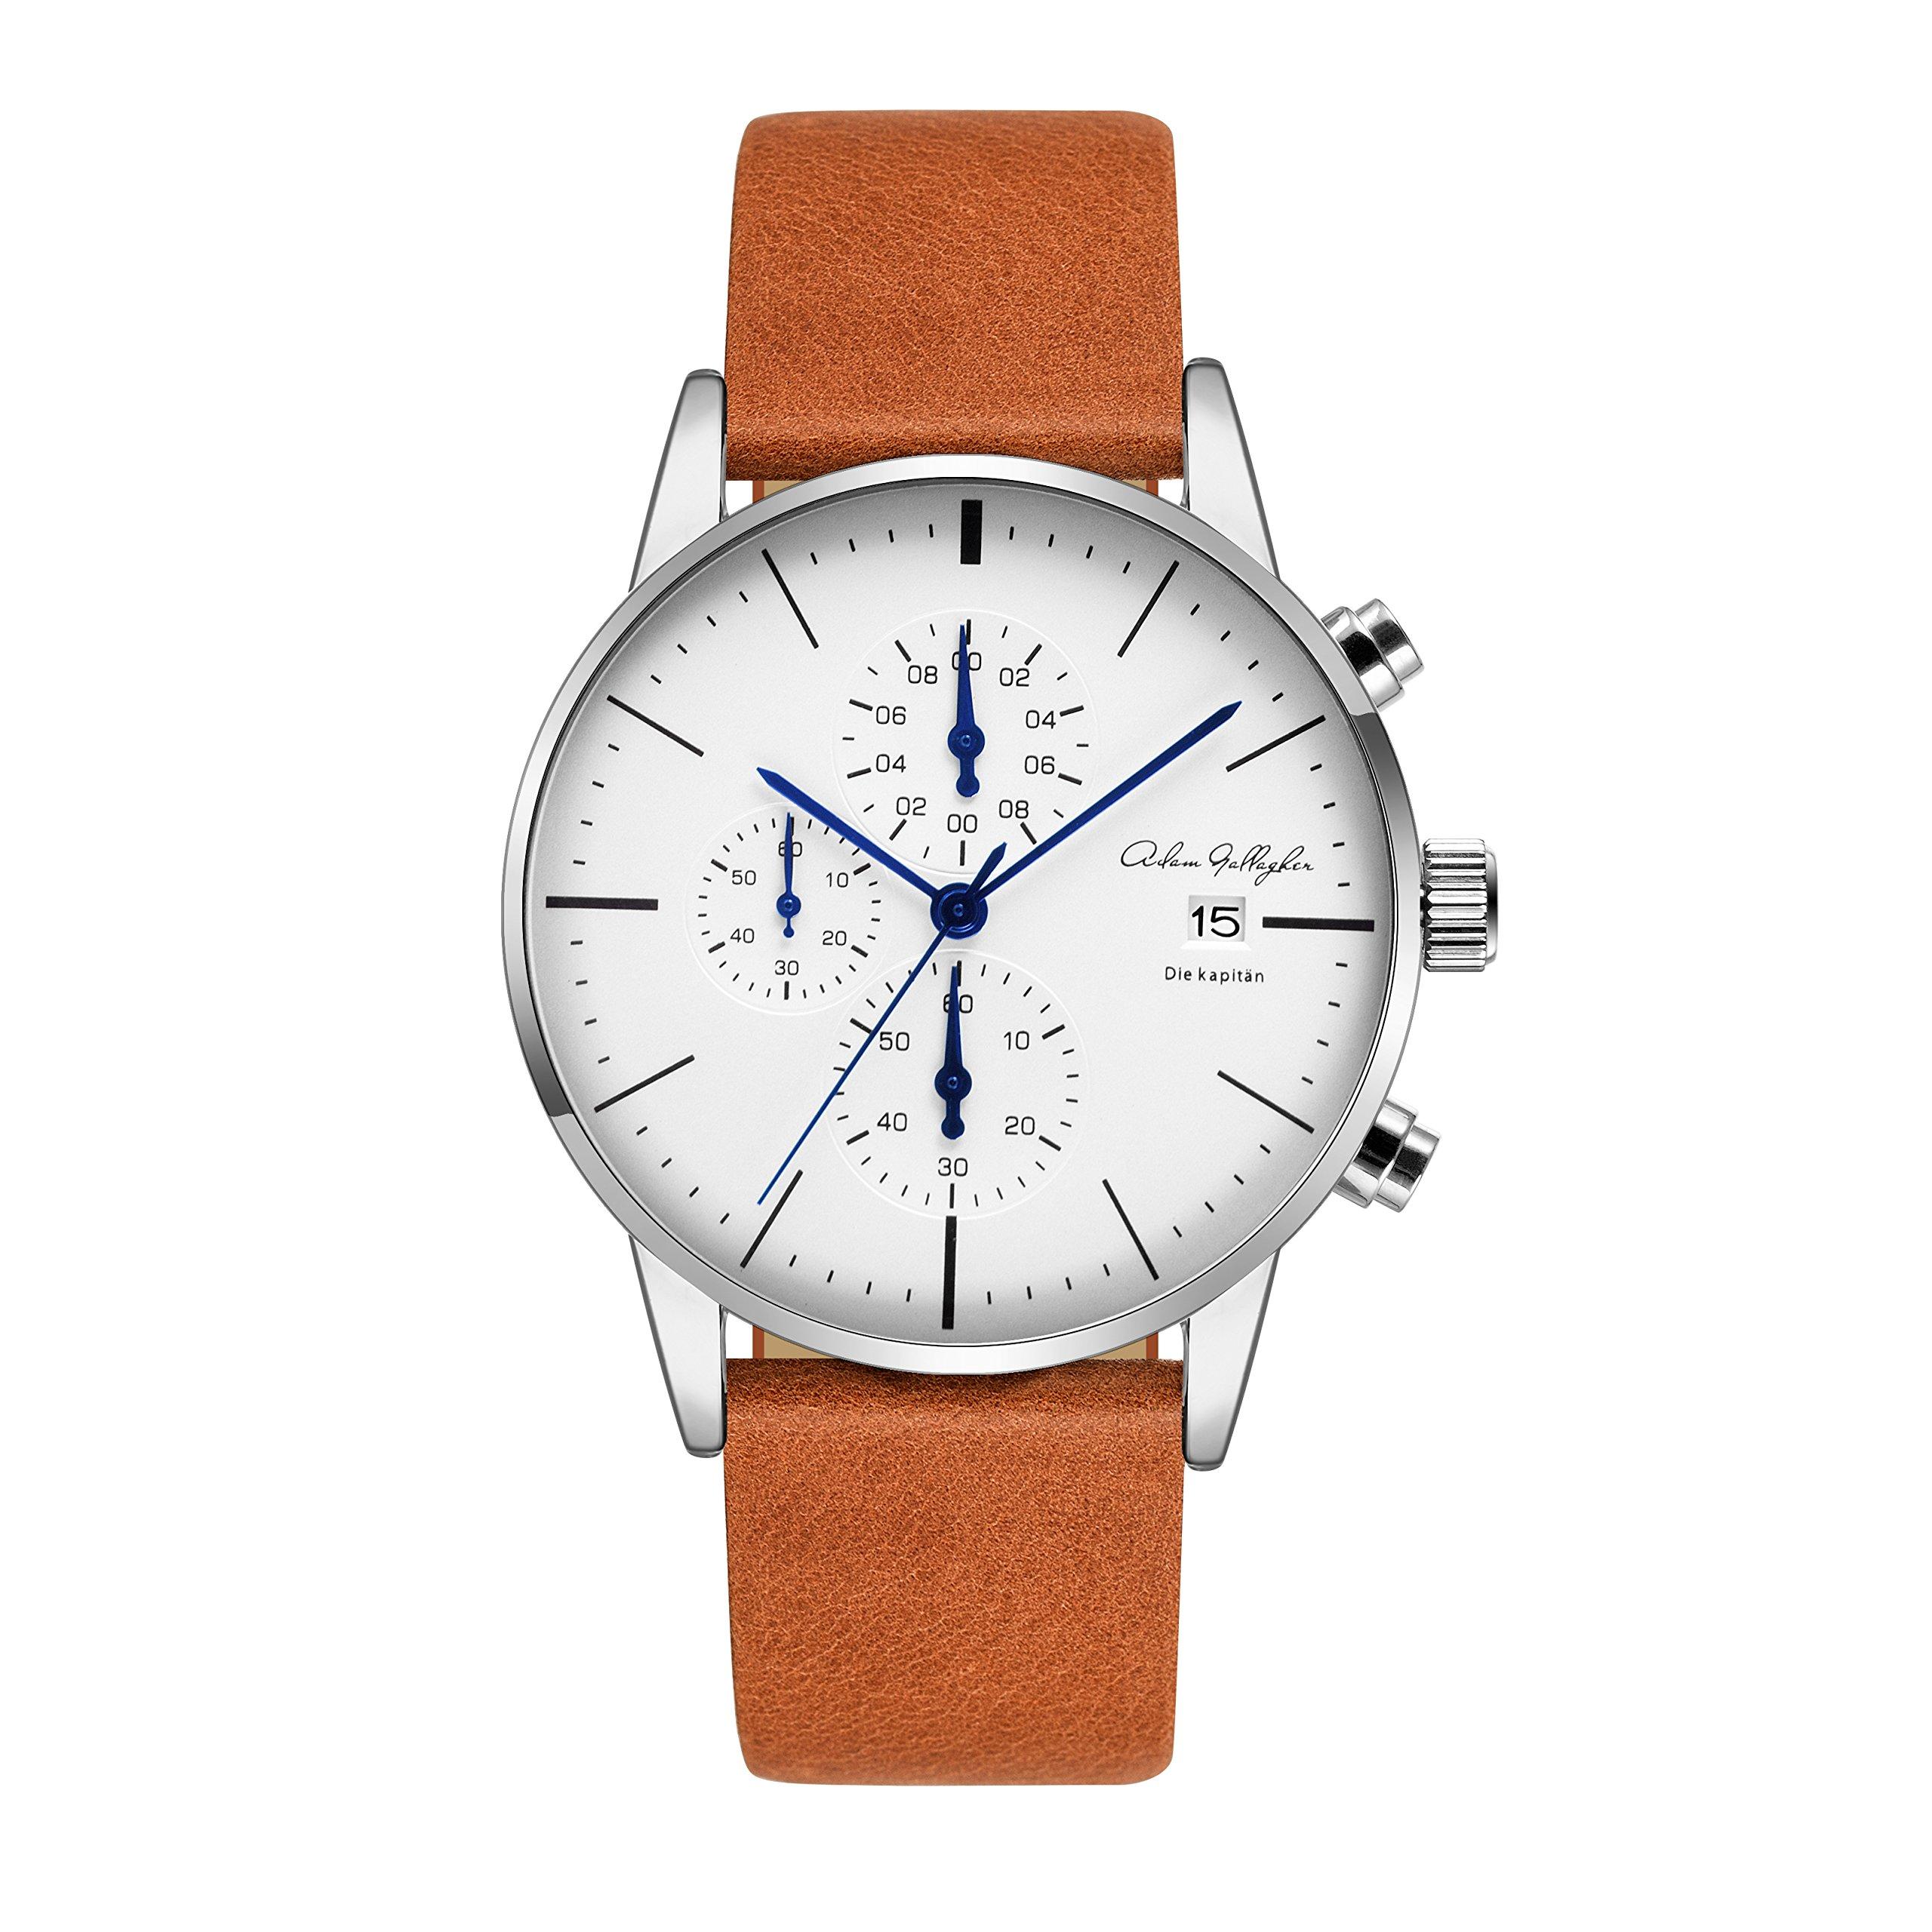 Adam Gallagher Men's Watches 43mm Wrist Quartz Multi Function Chronograph Watch Brown Leather Strap